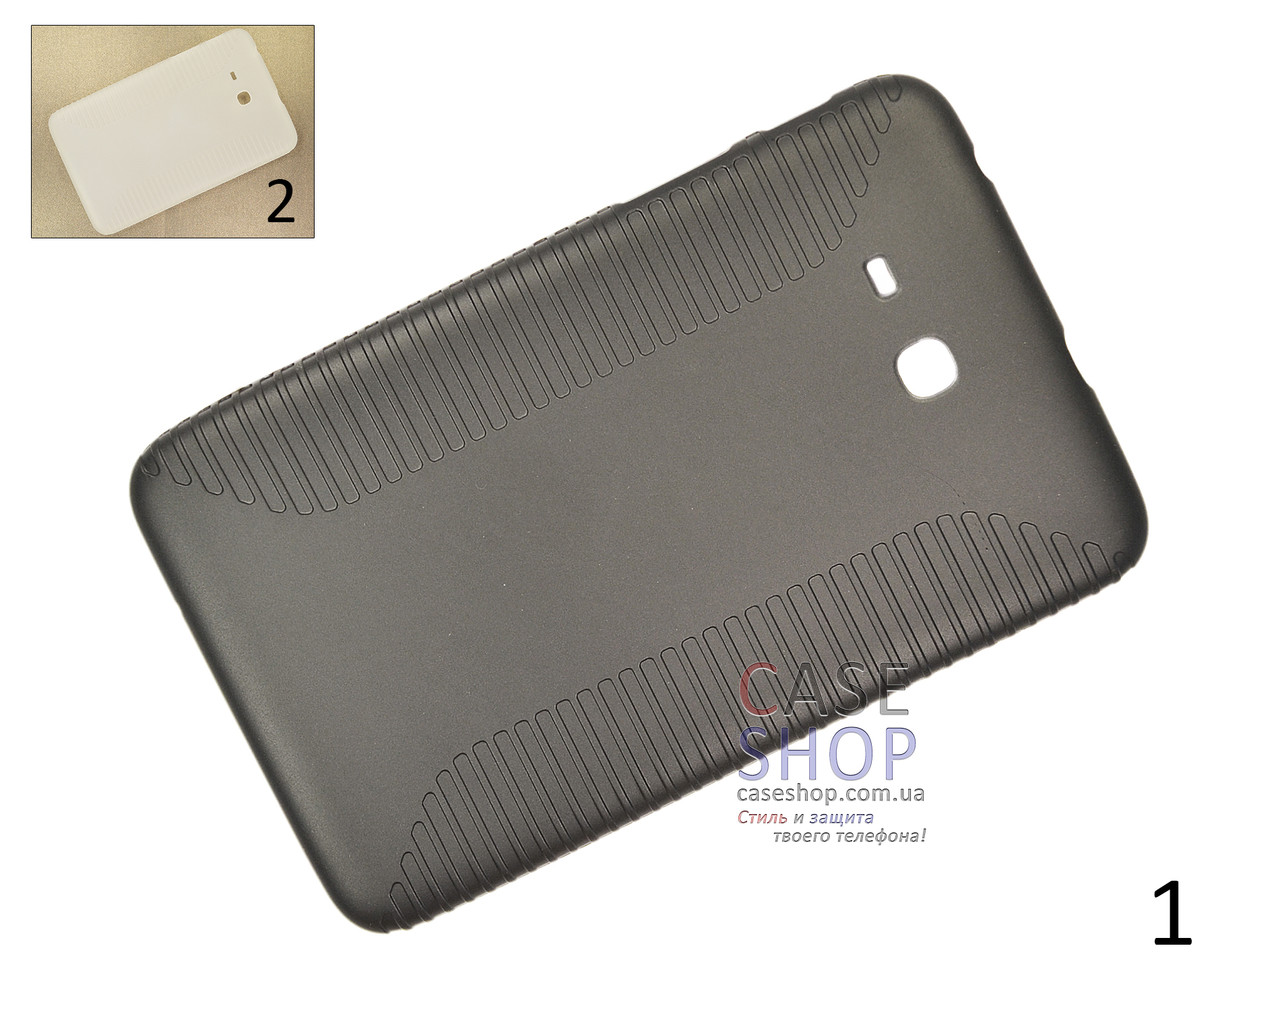 Силиконовый чехол для Samsung Galaxy Tab 3 Lite 7 T110/T111